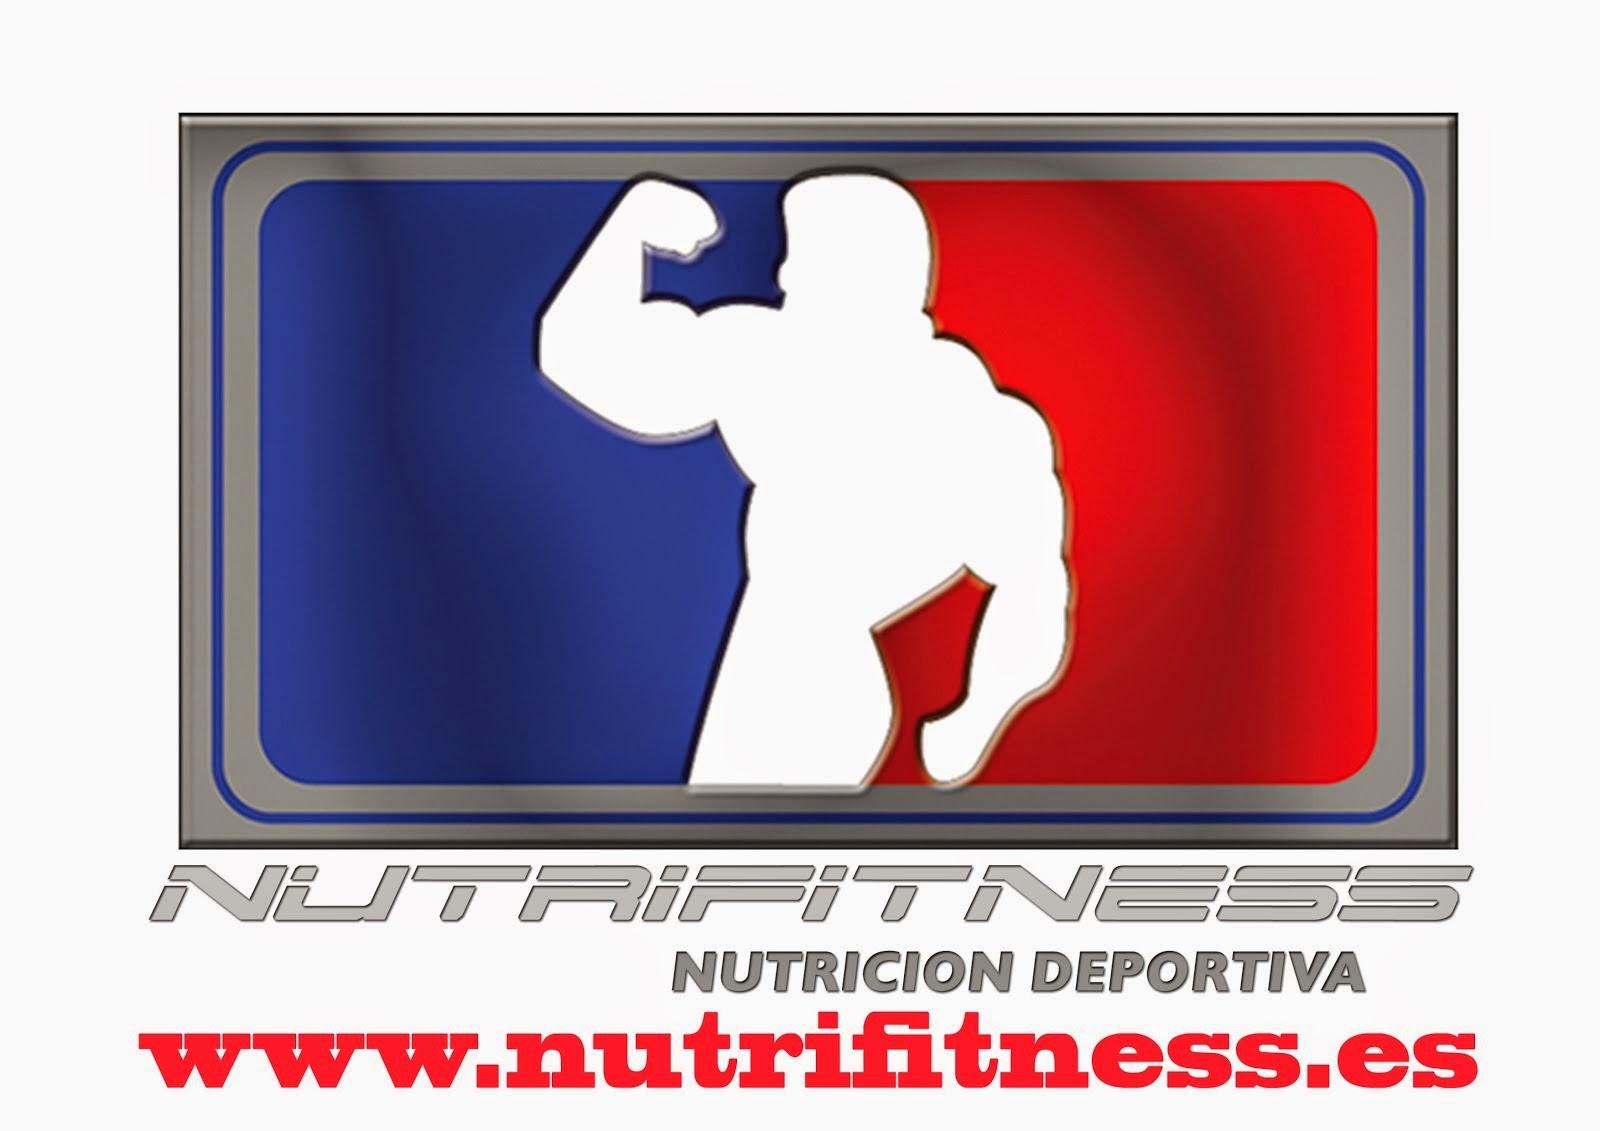 NUTRIFITNESS